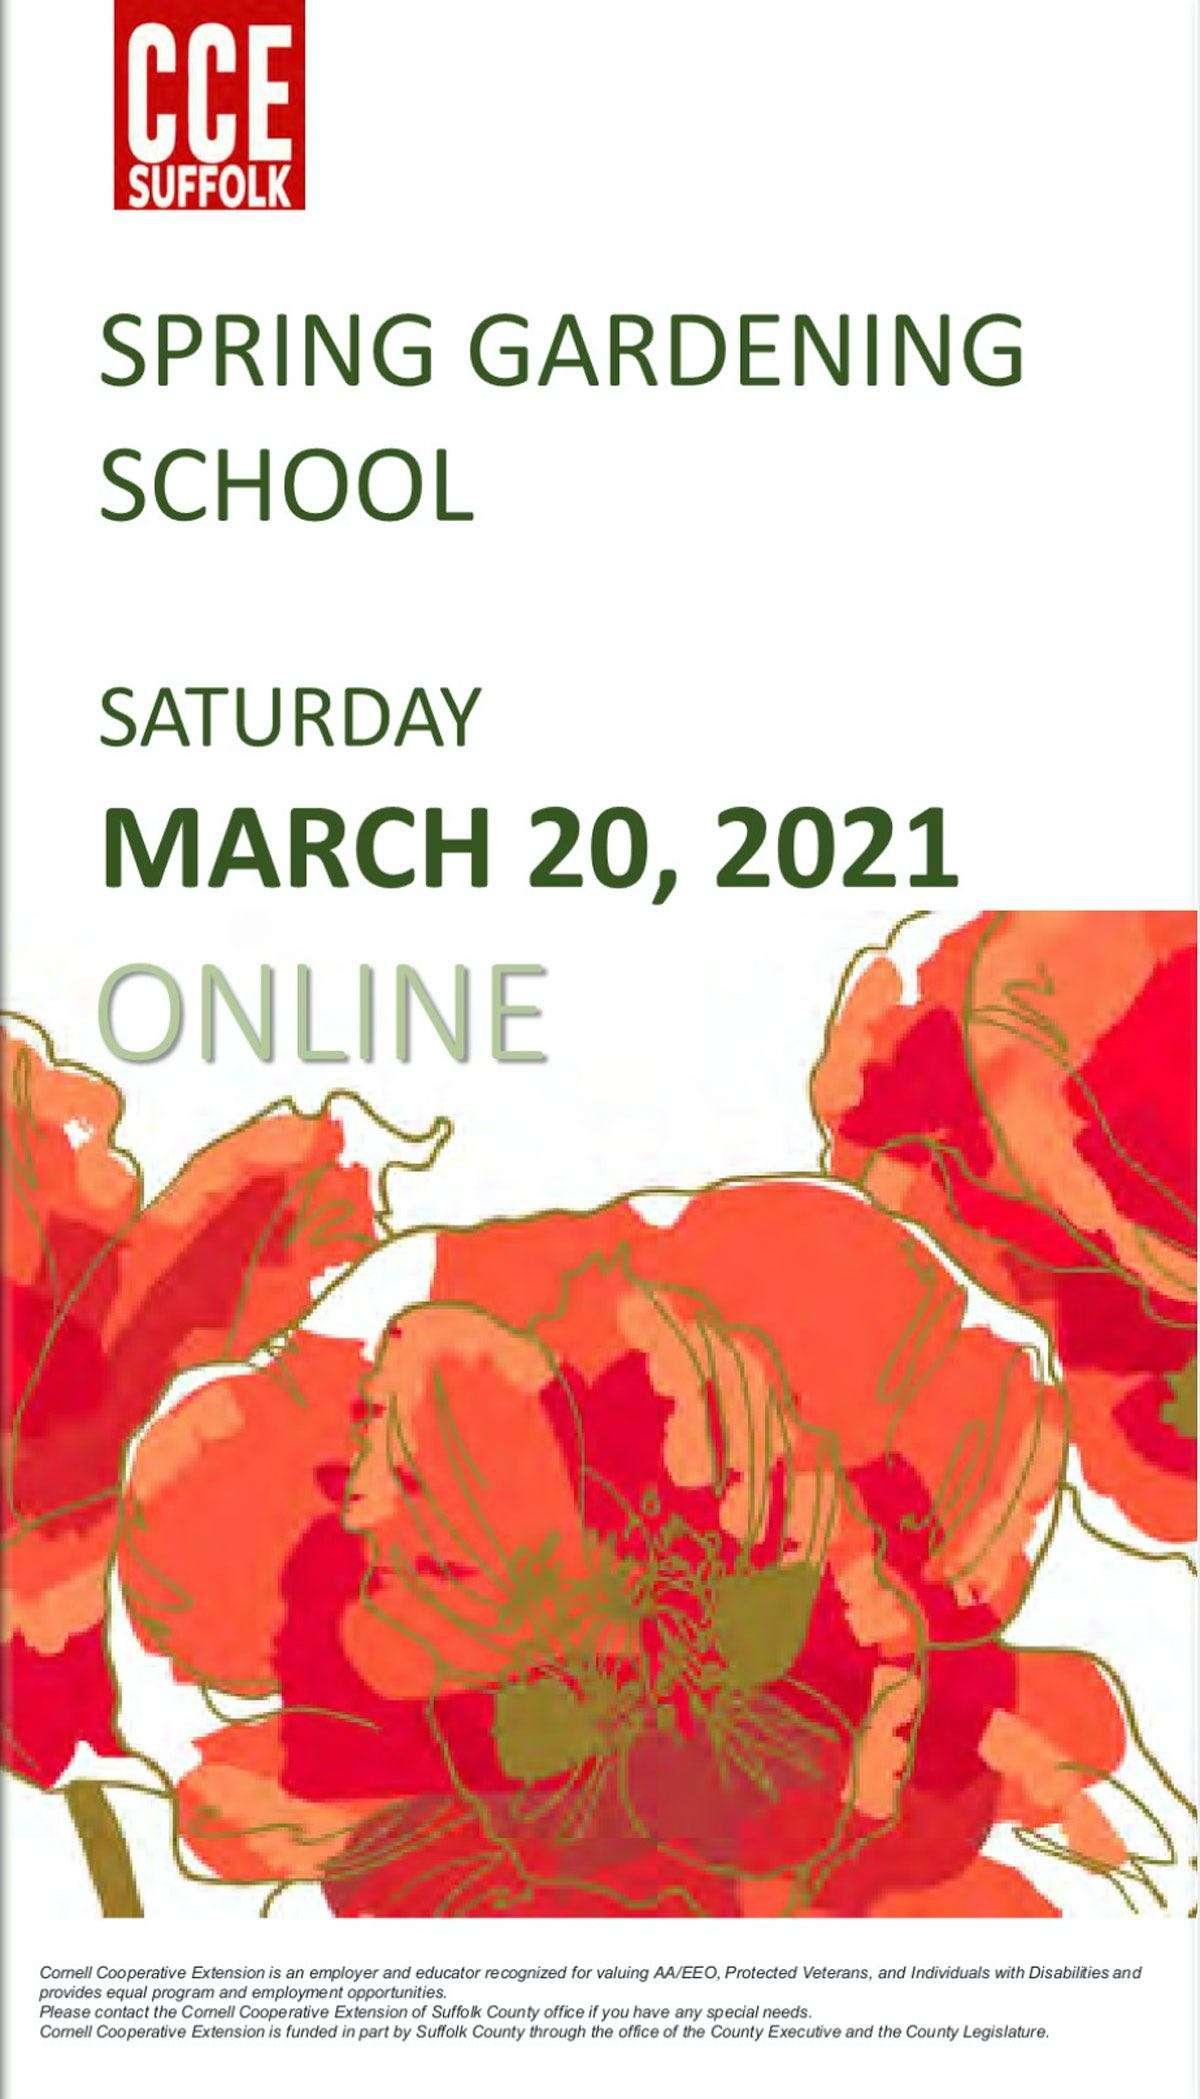 Ann-Marie Powell speaking at Suffolk County Spring Gardening School